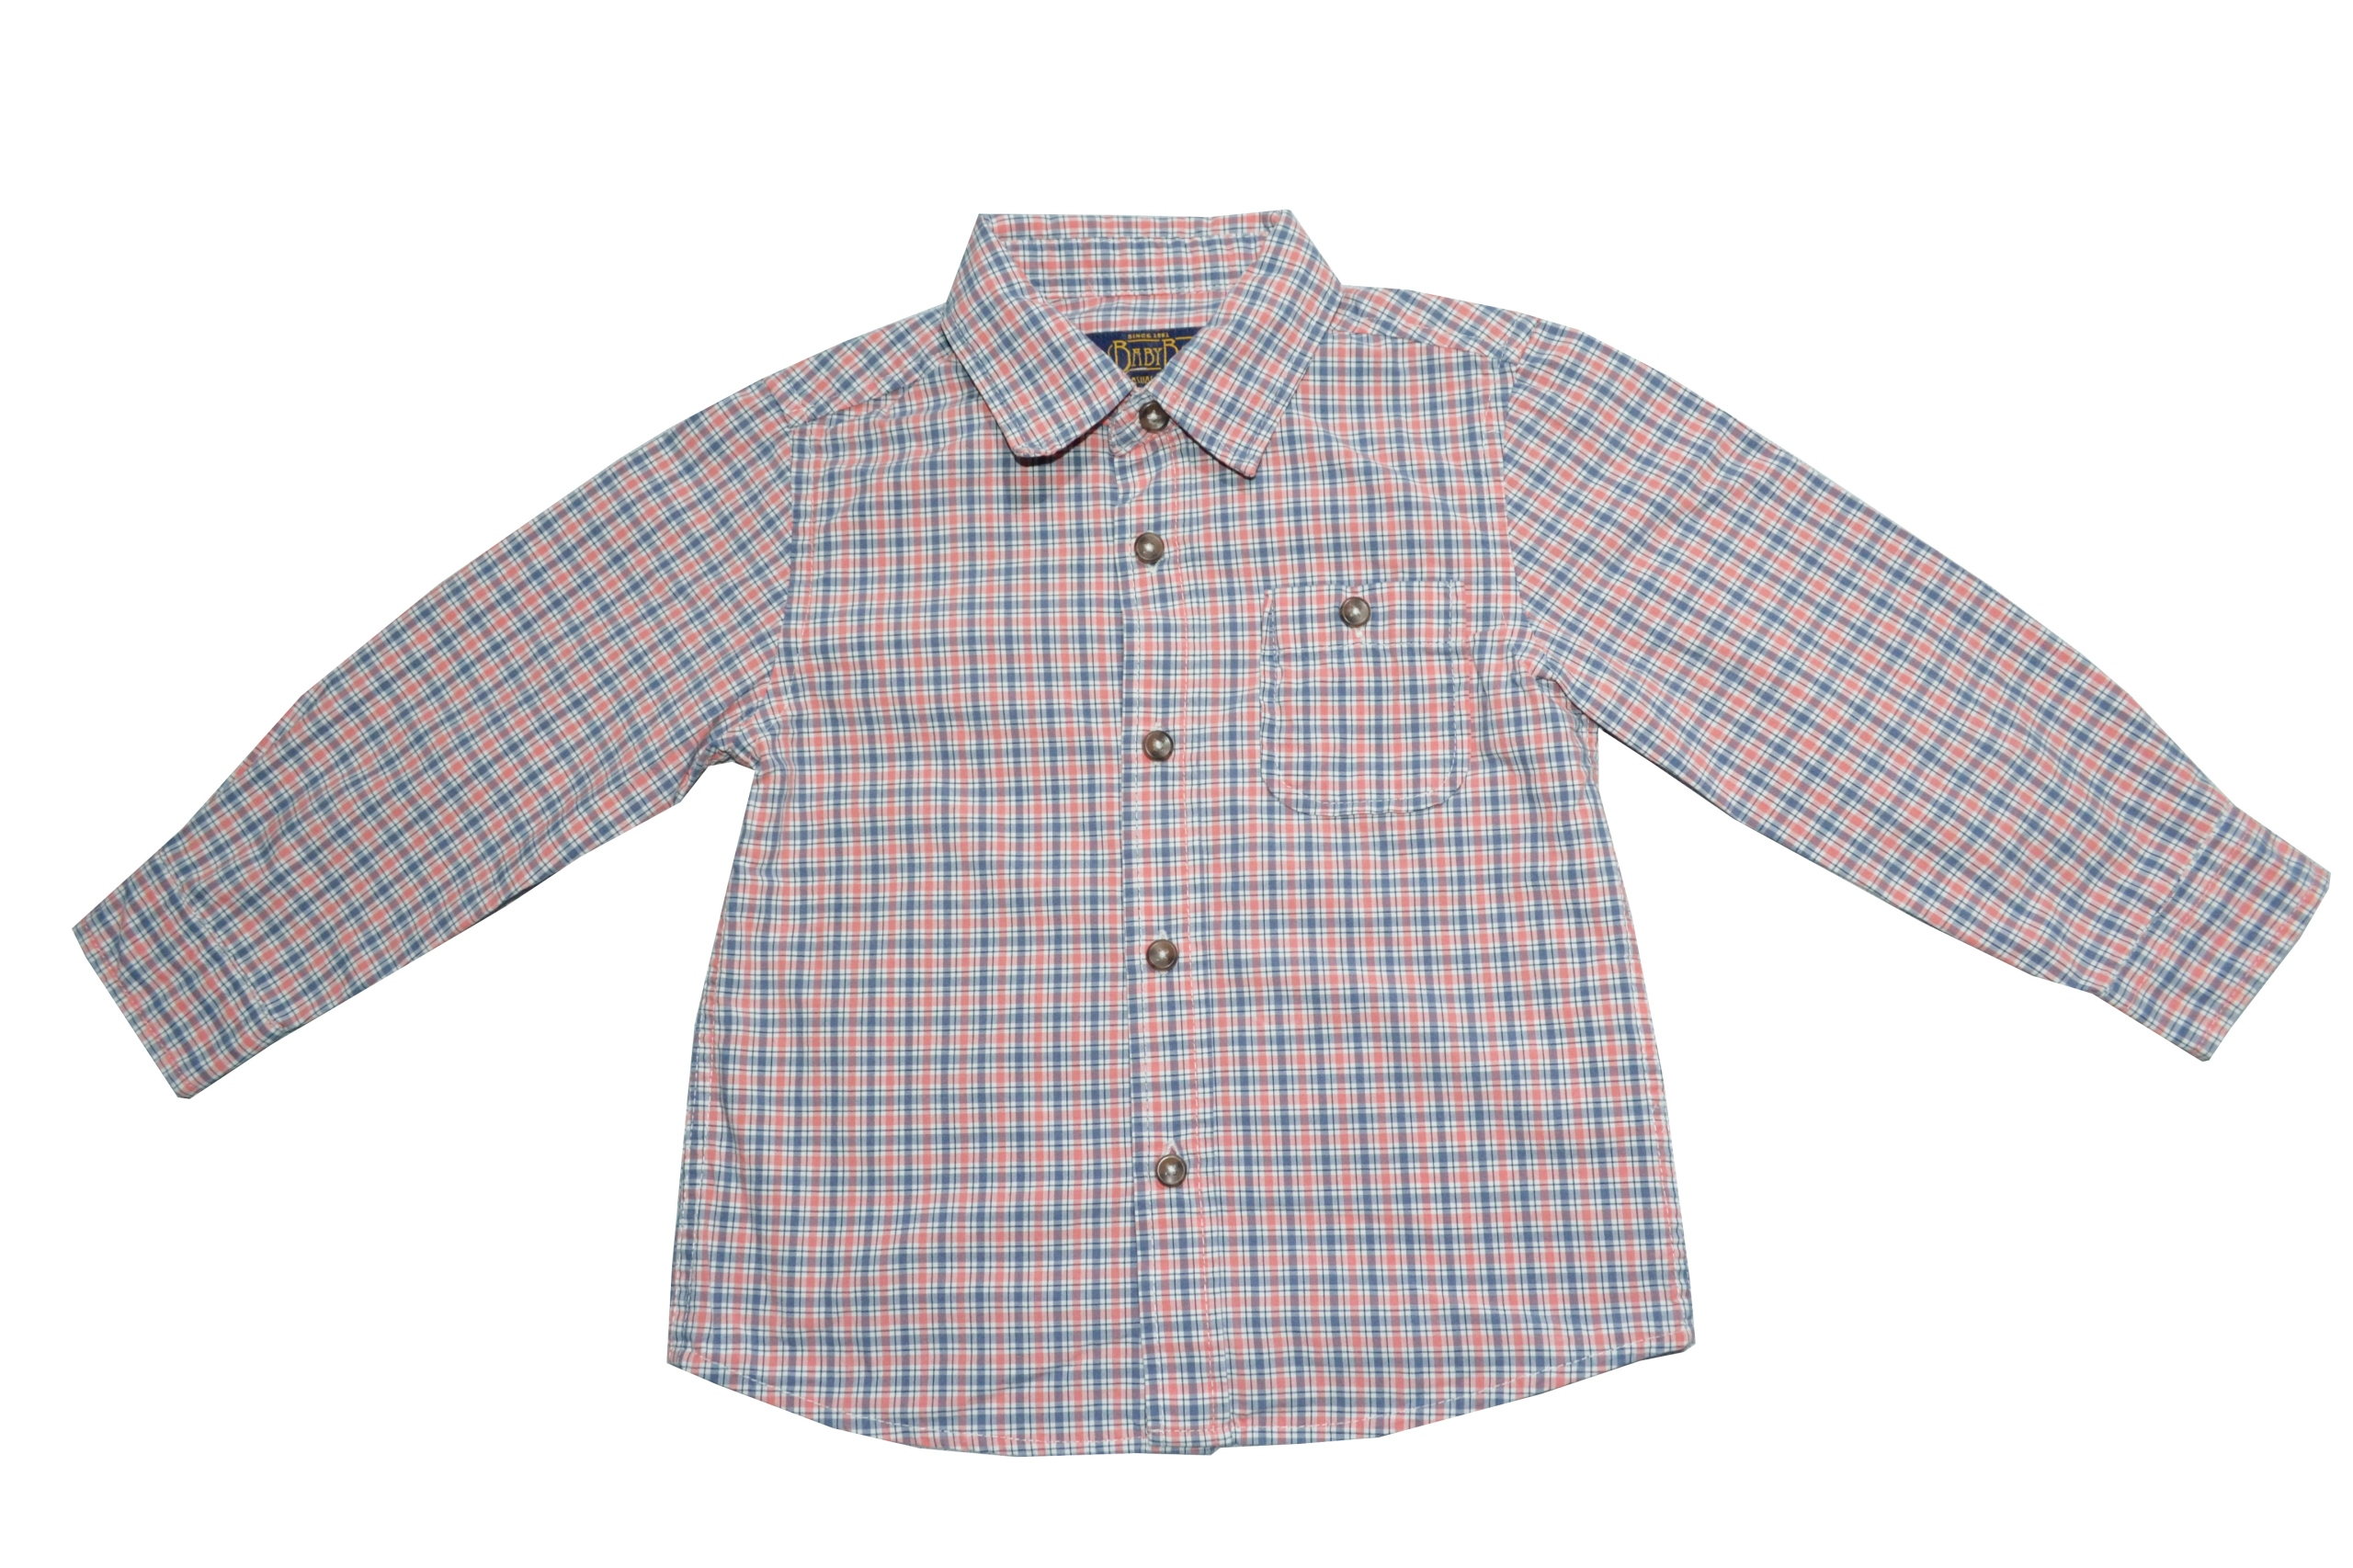 O920. ZARA koszula r. 82, 12-18 m-cy